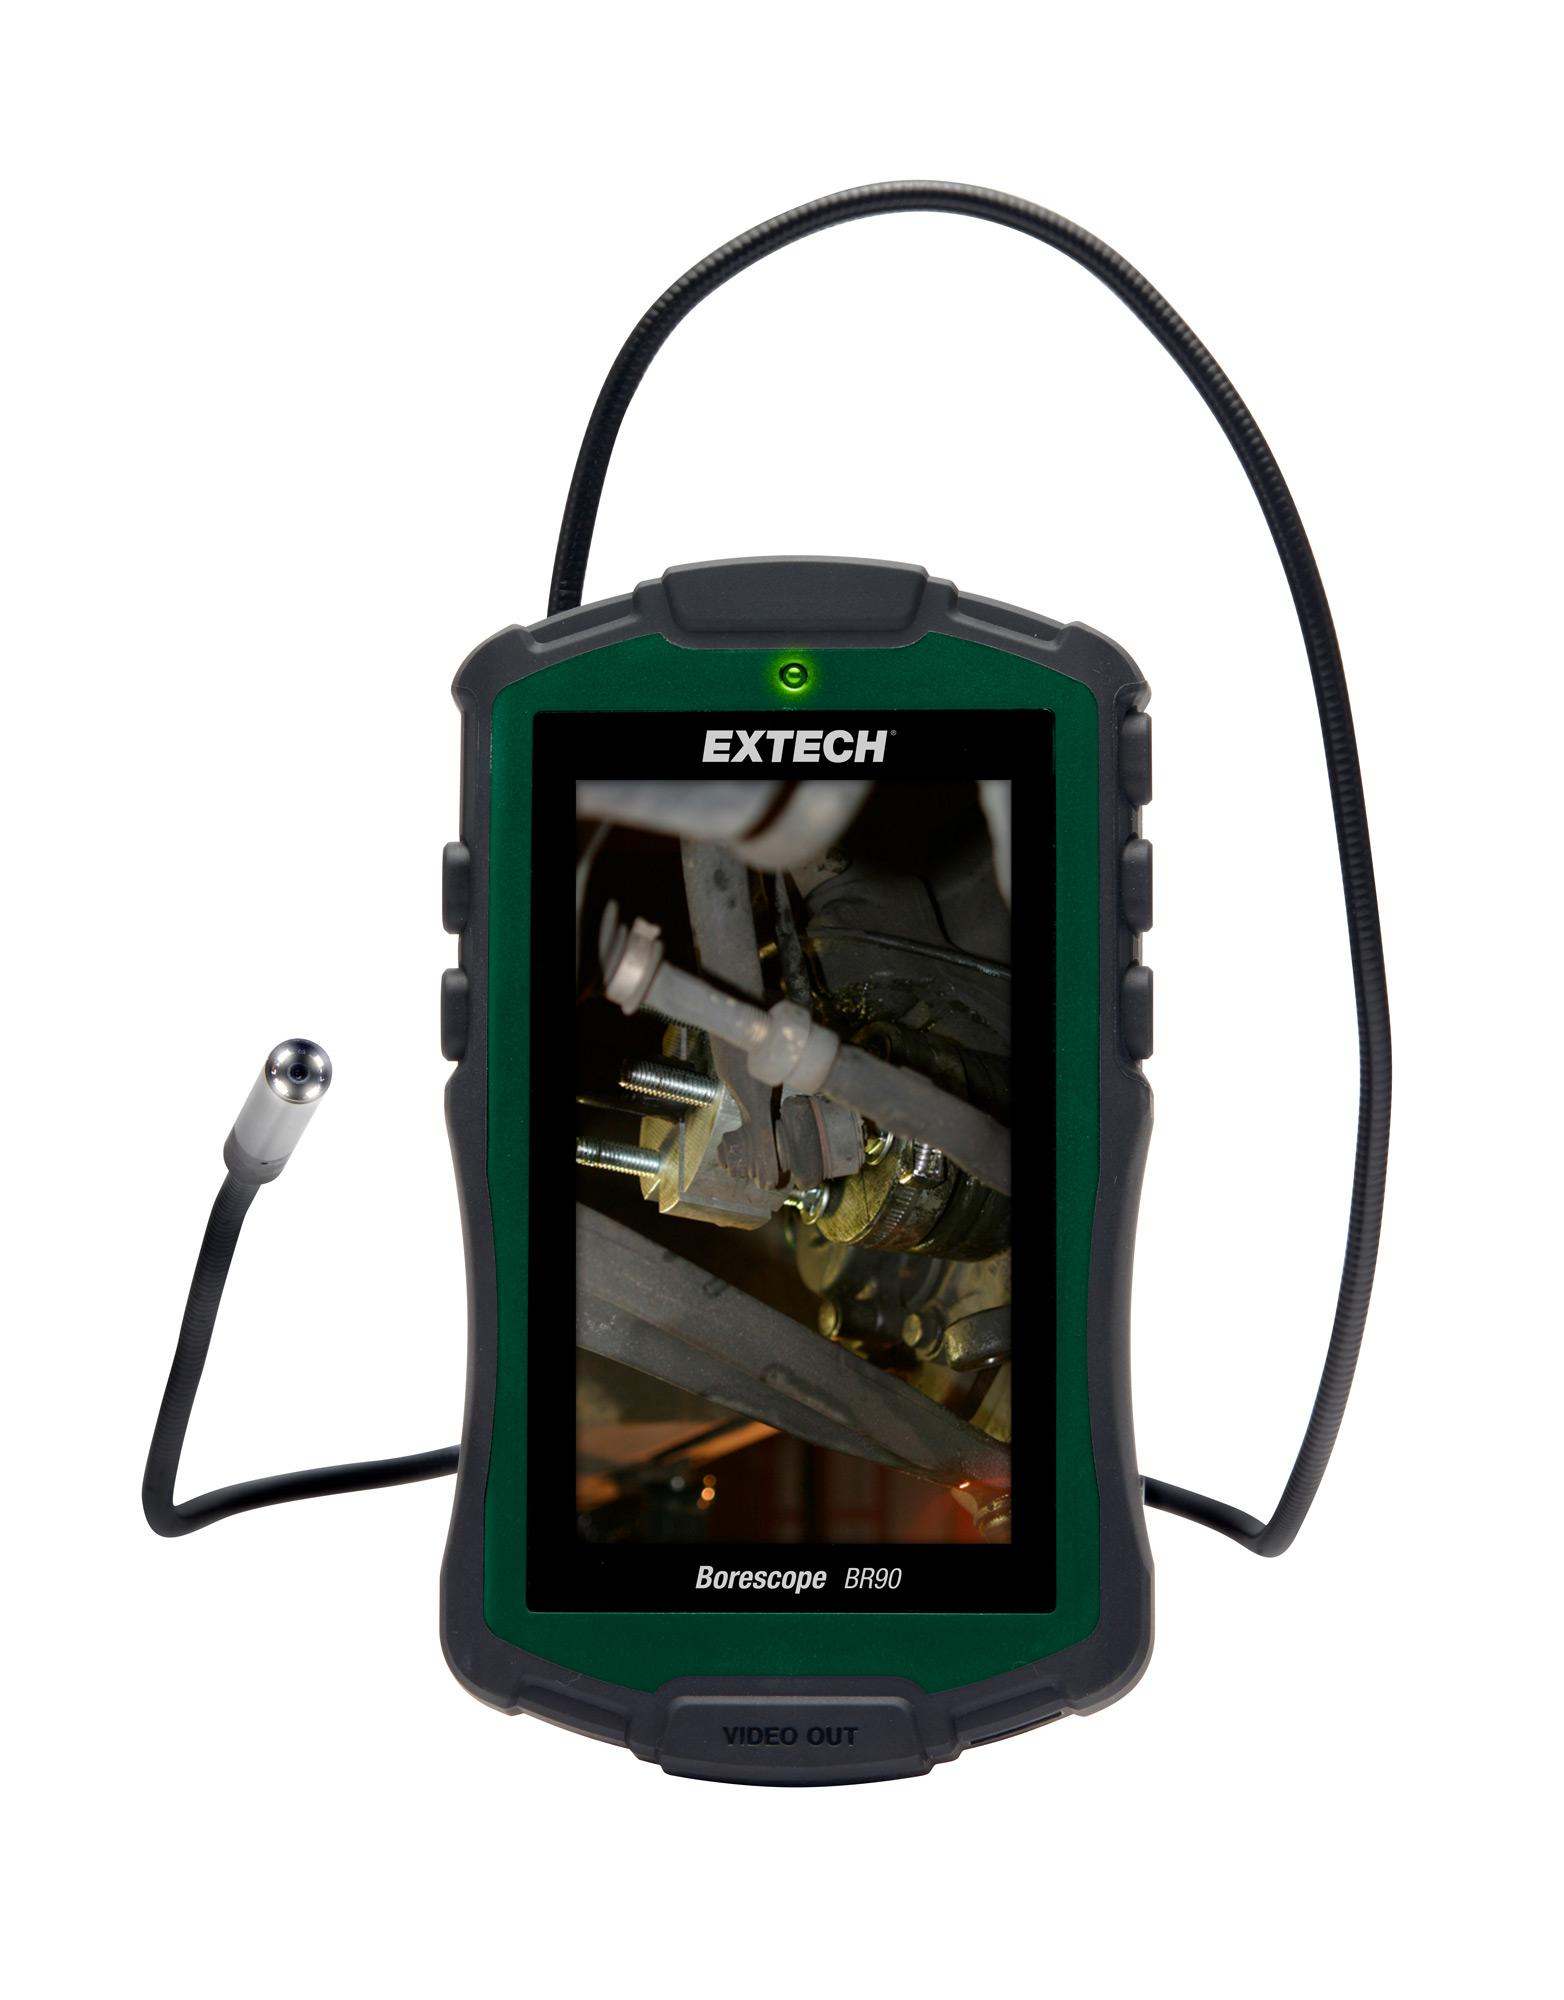 Extech BR90 Borescope